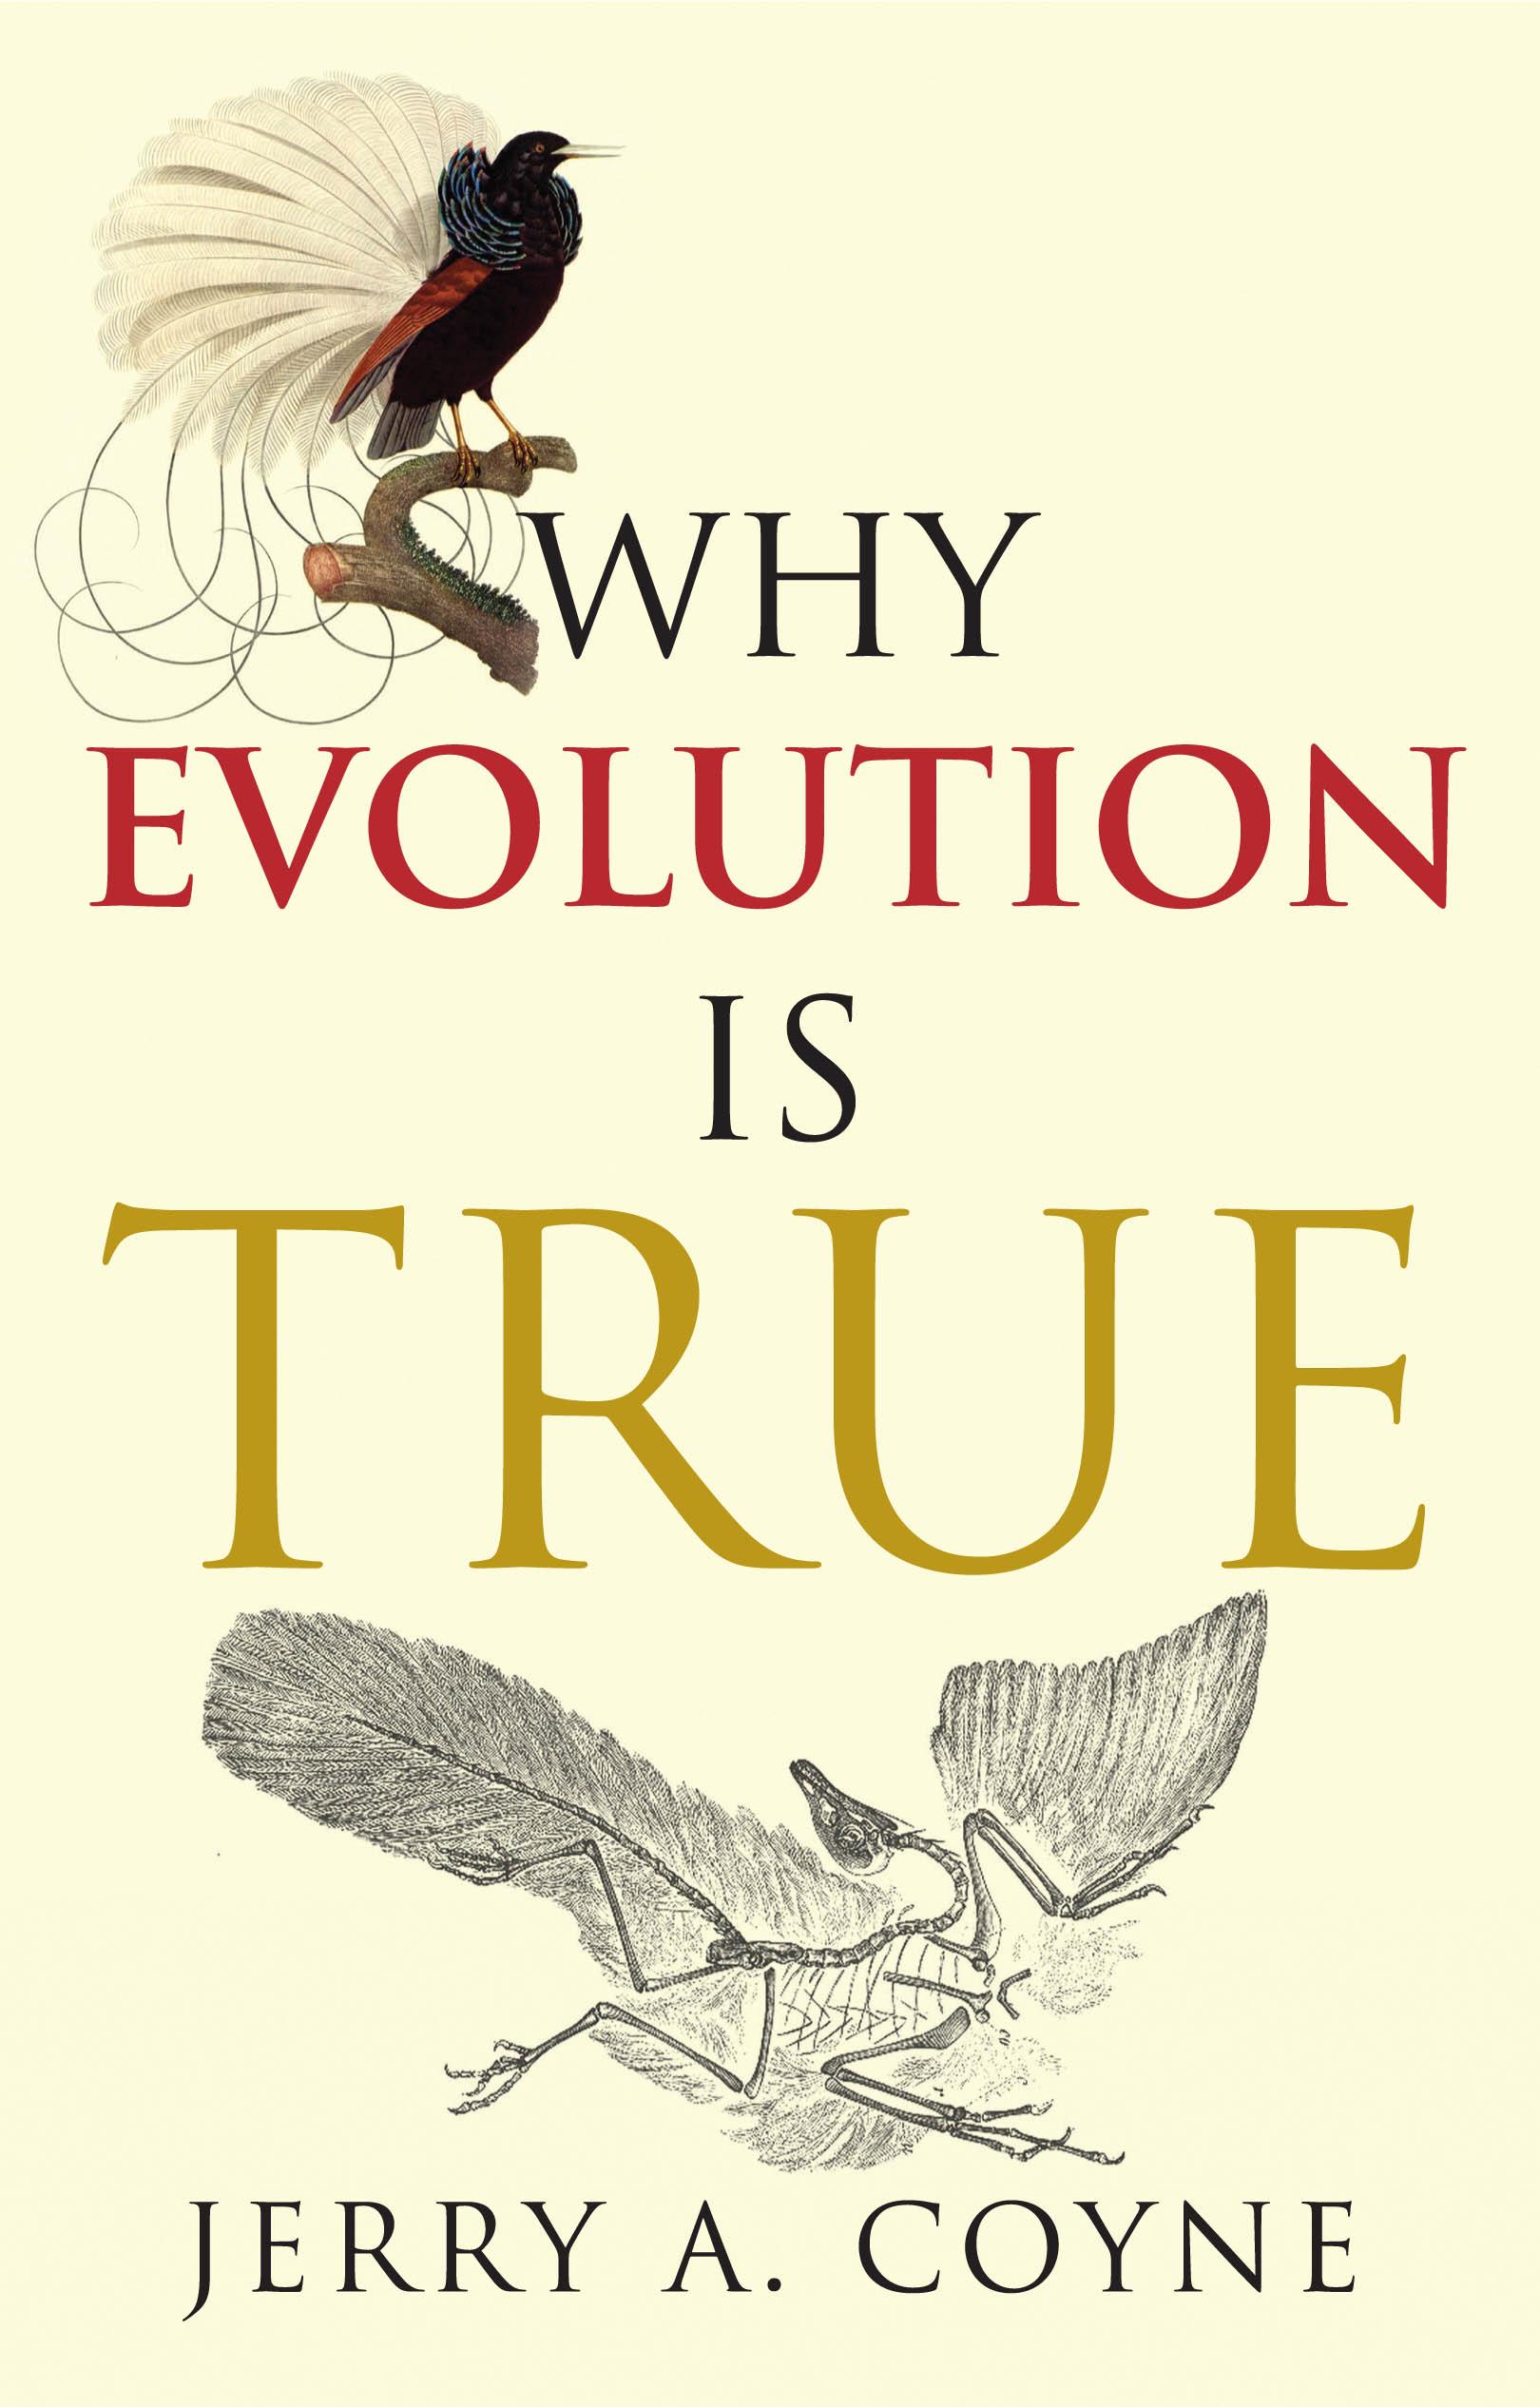 coyne_why_evolution_is_true